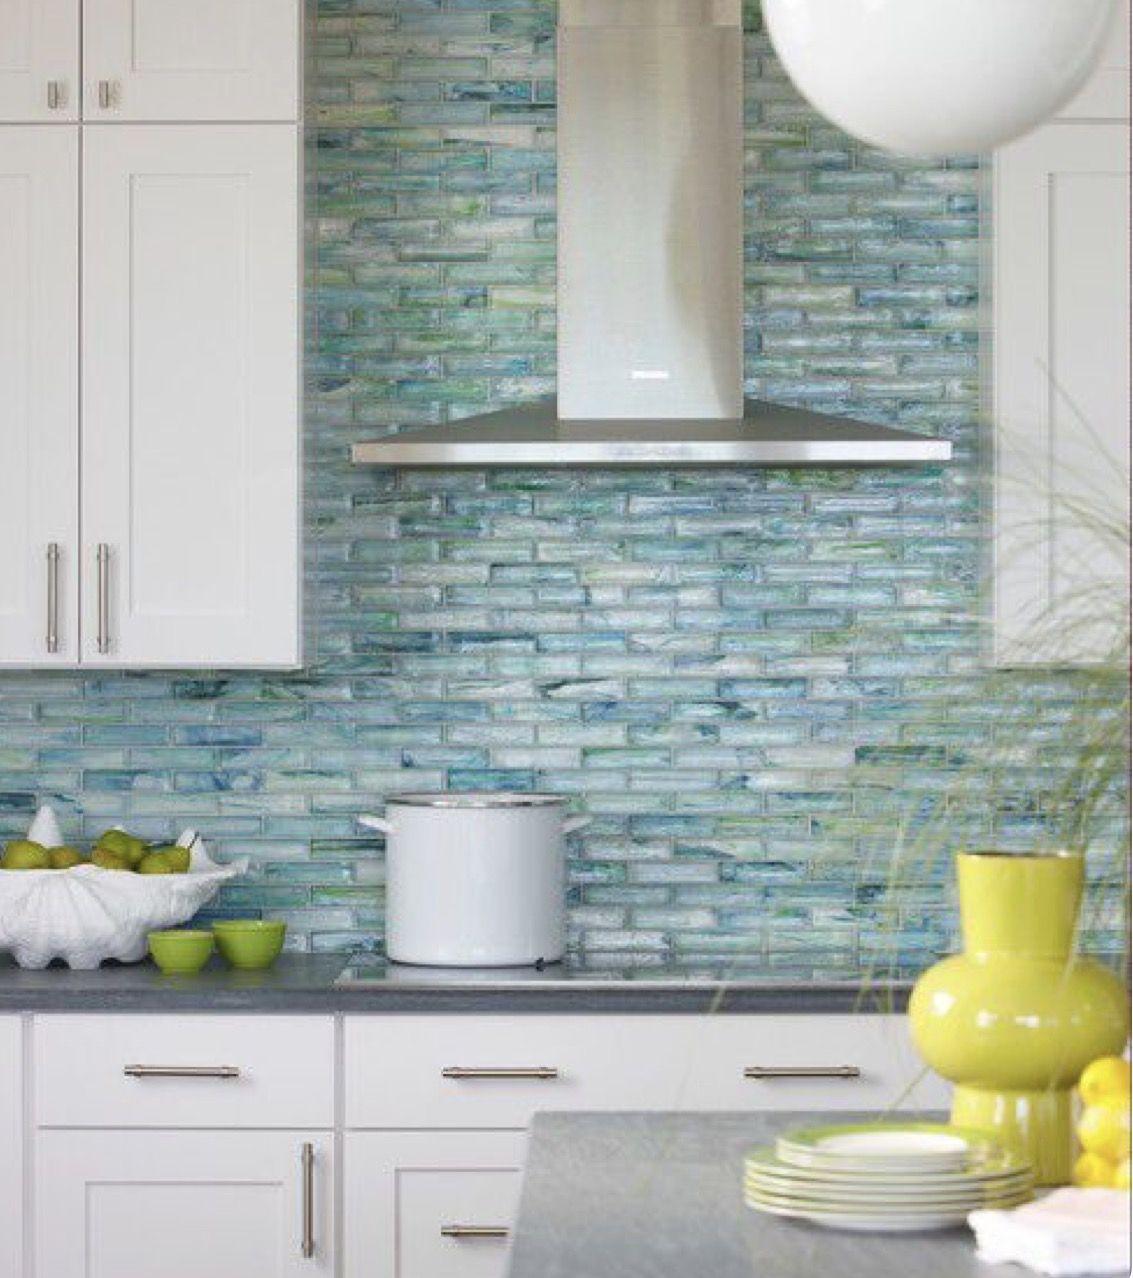 Real and green back splasplash | Condo Renovation Ideas | Pinterest ...